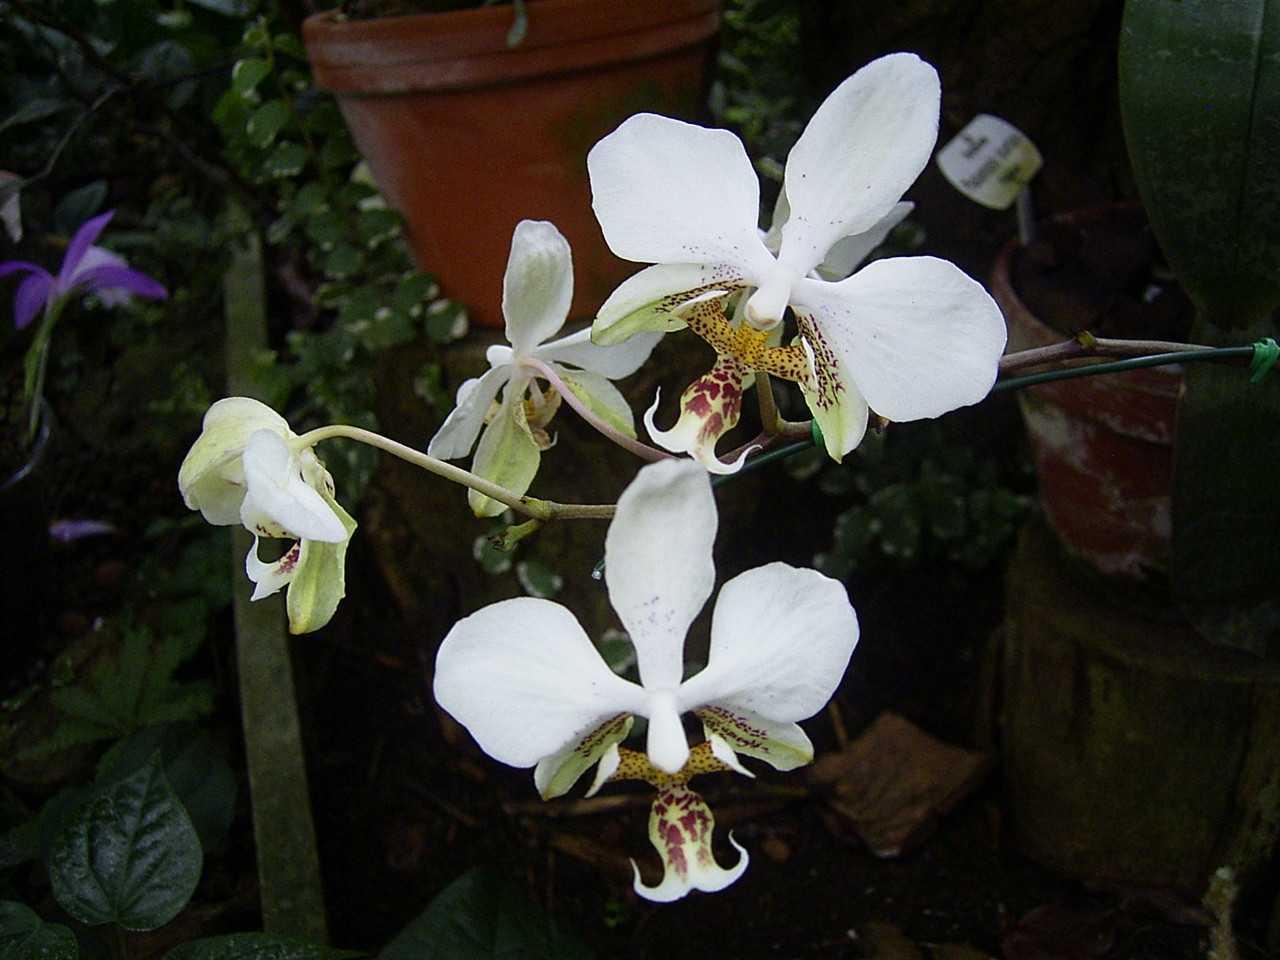 orhideya-falenopsis-foto-video-vidyi-falenopsis-harakteristika-i-opisanie-5